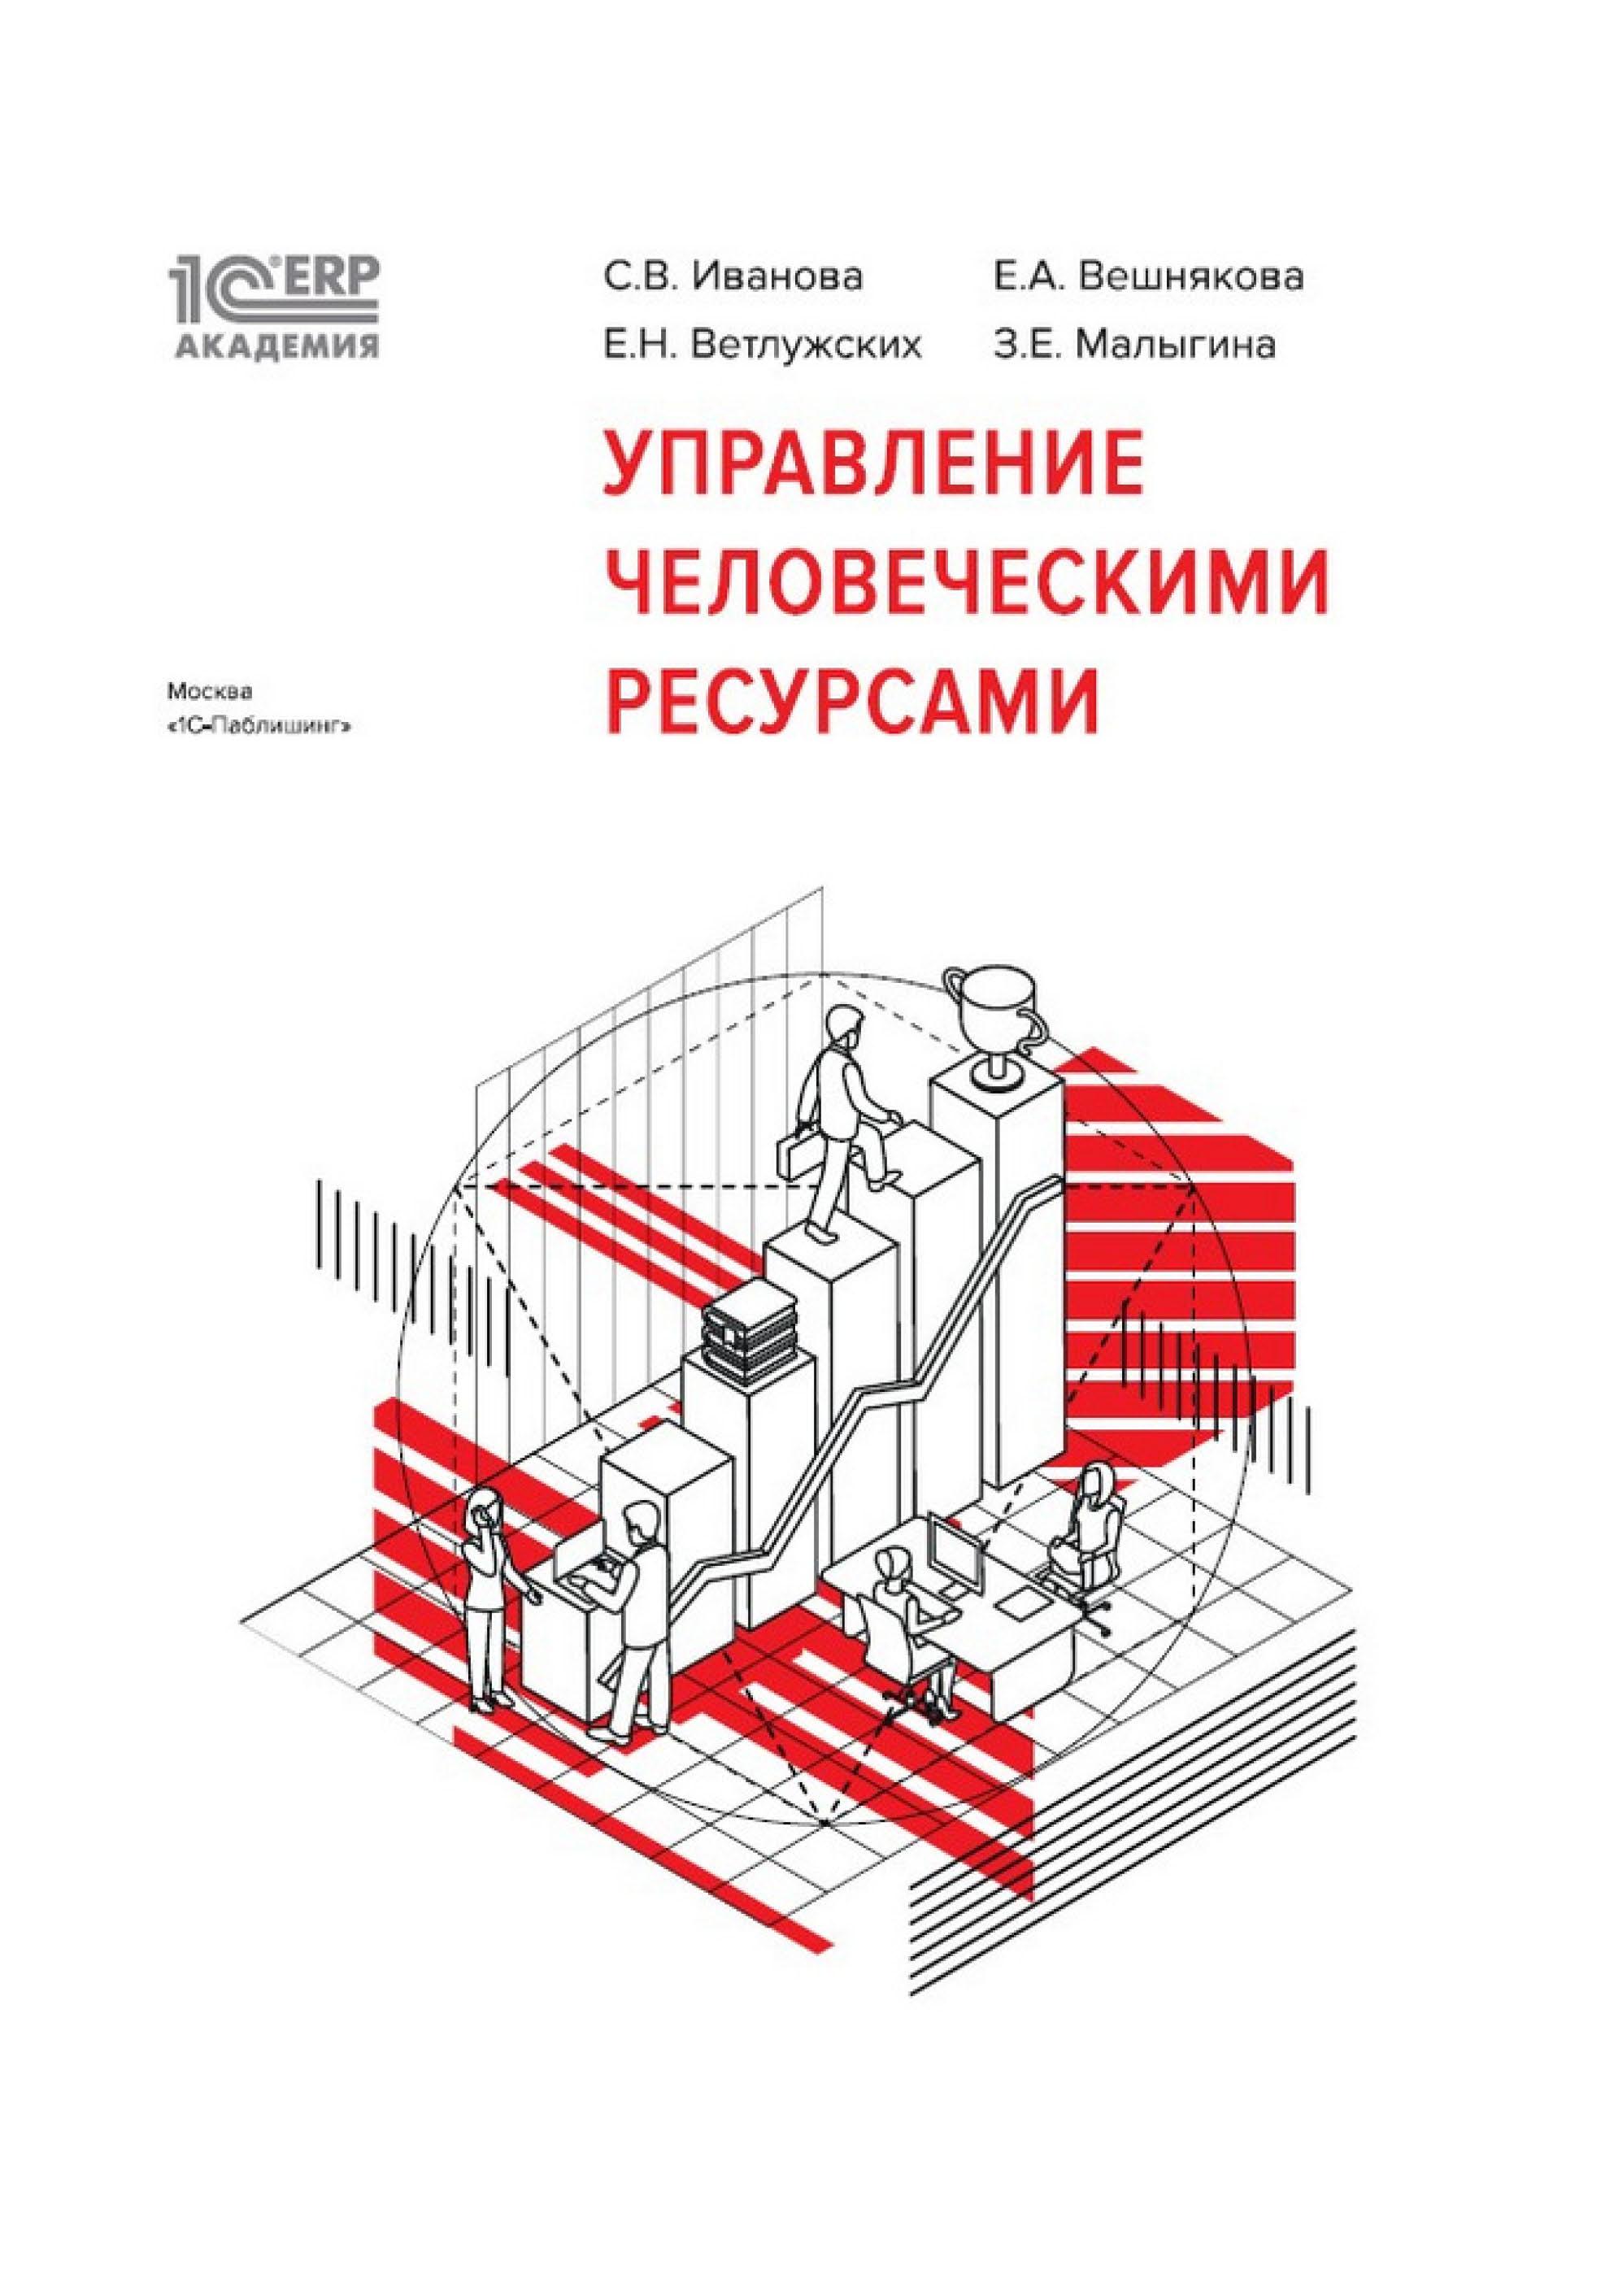 Светлана Иванова 1С:Академия ERP. Управление человеческими ресурсами (+epub)